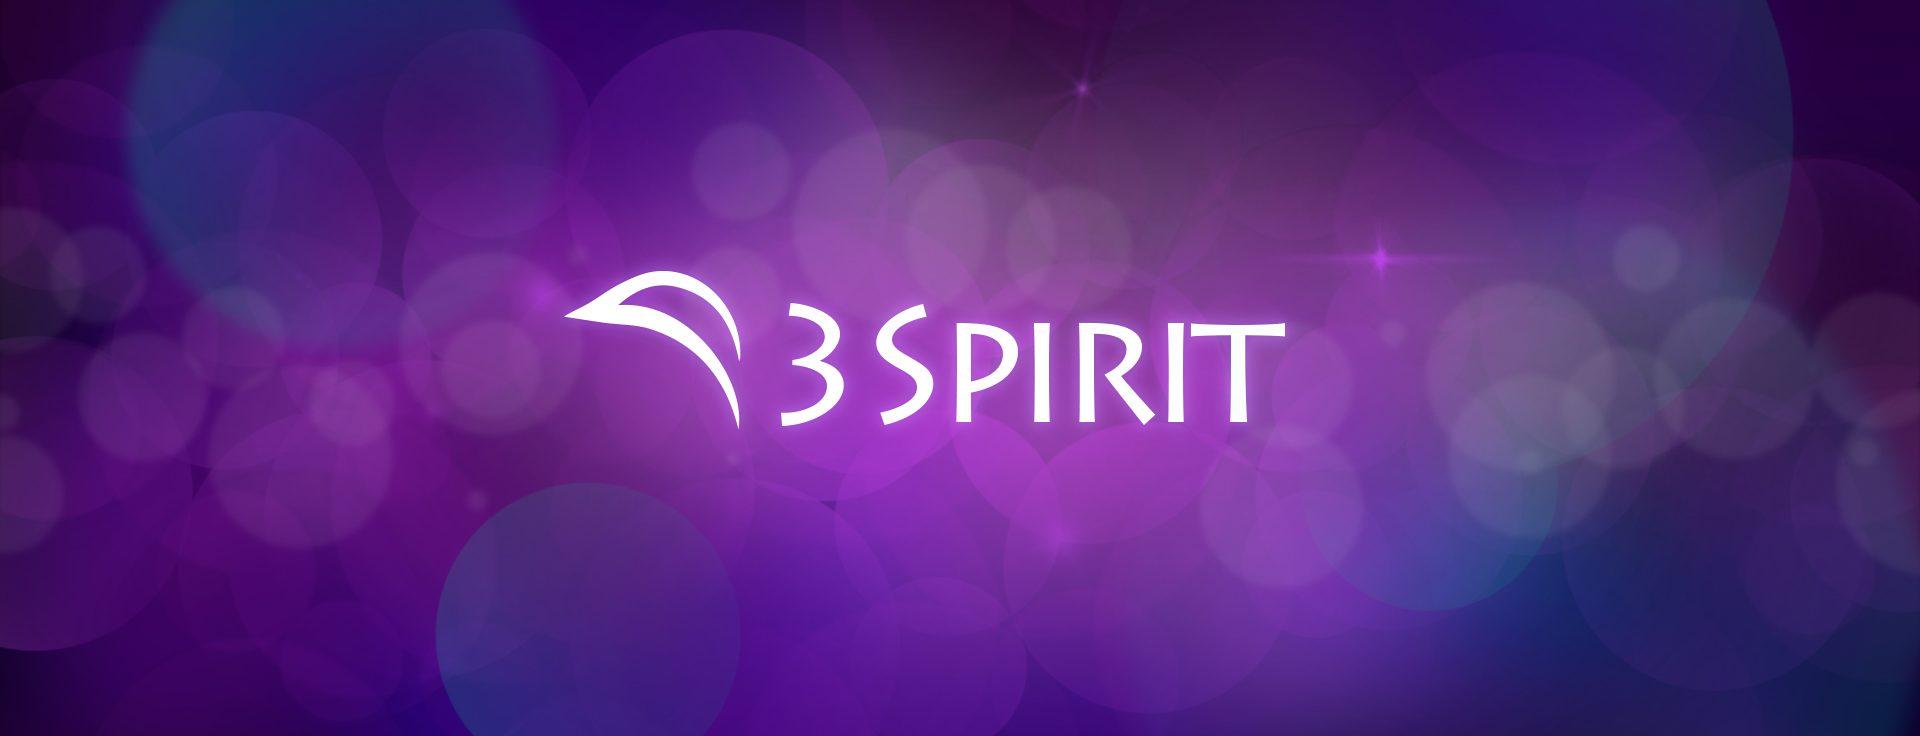 3Spirit